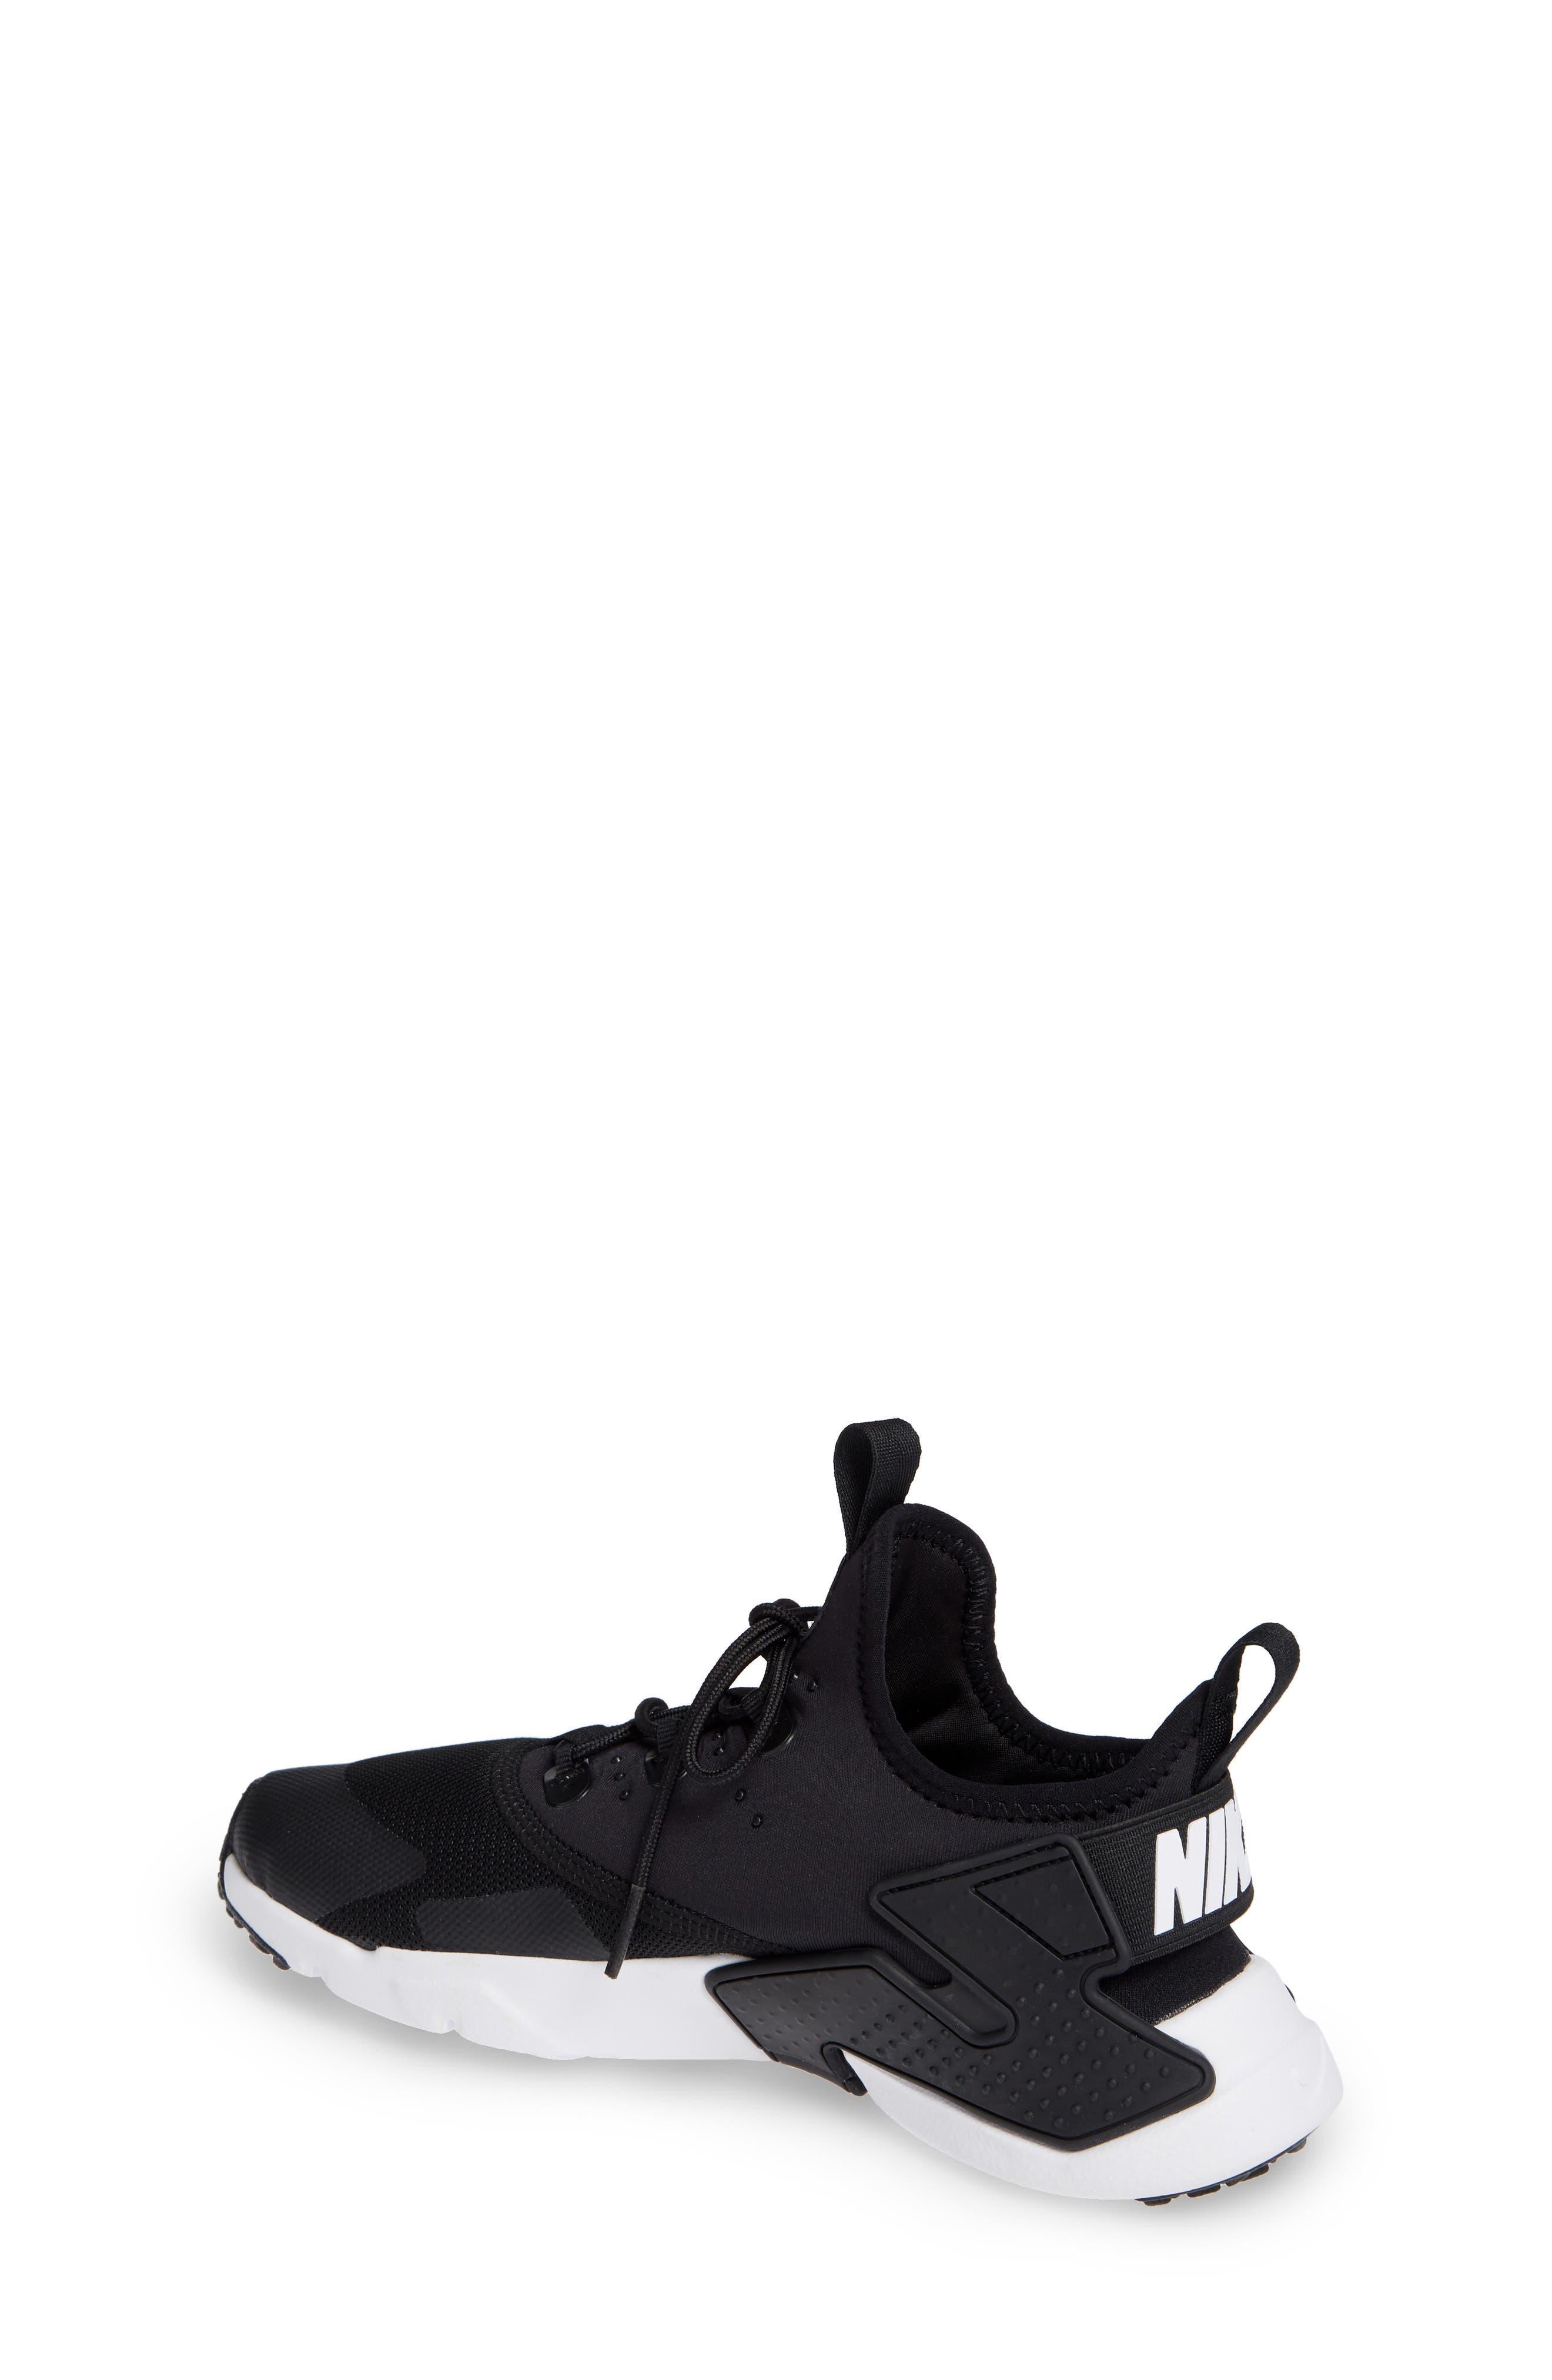 Huarache Run Drift Sneaker,                             Alternate thumbnail 4, color,                             Black/ Anthracite